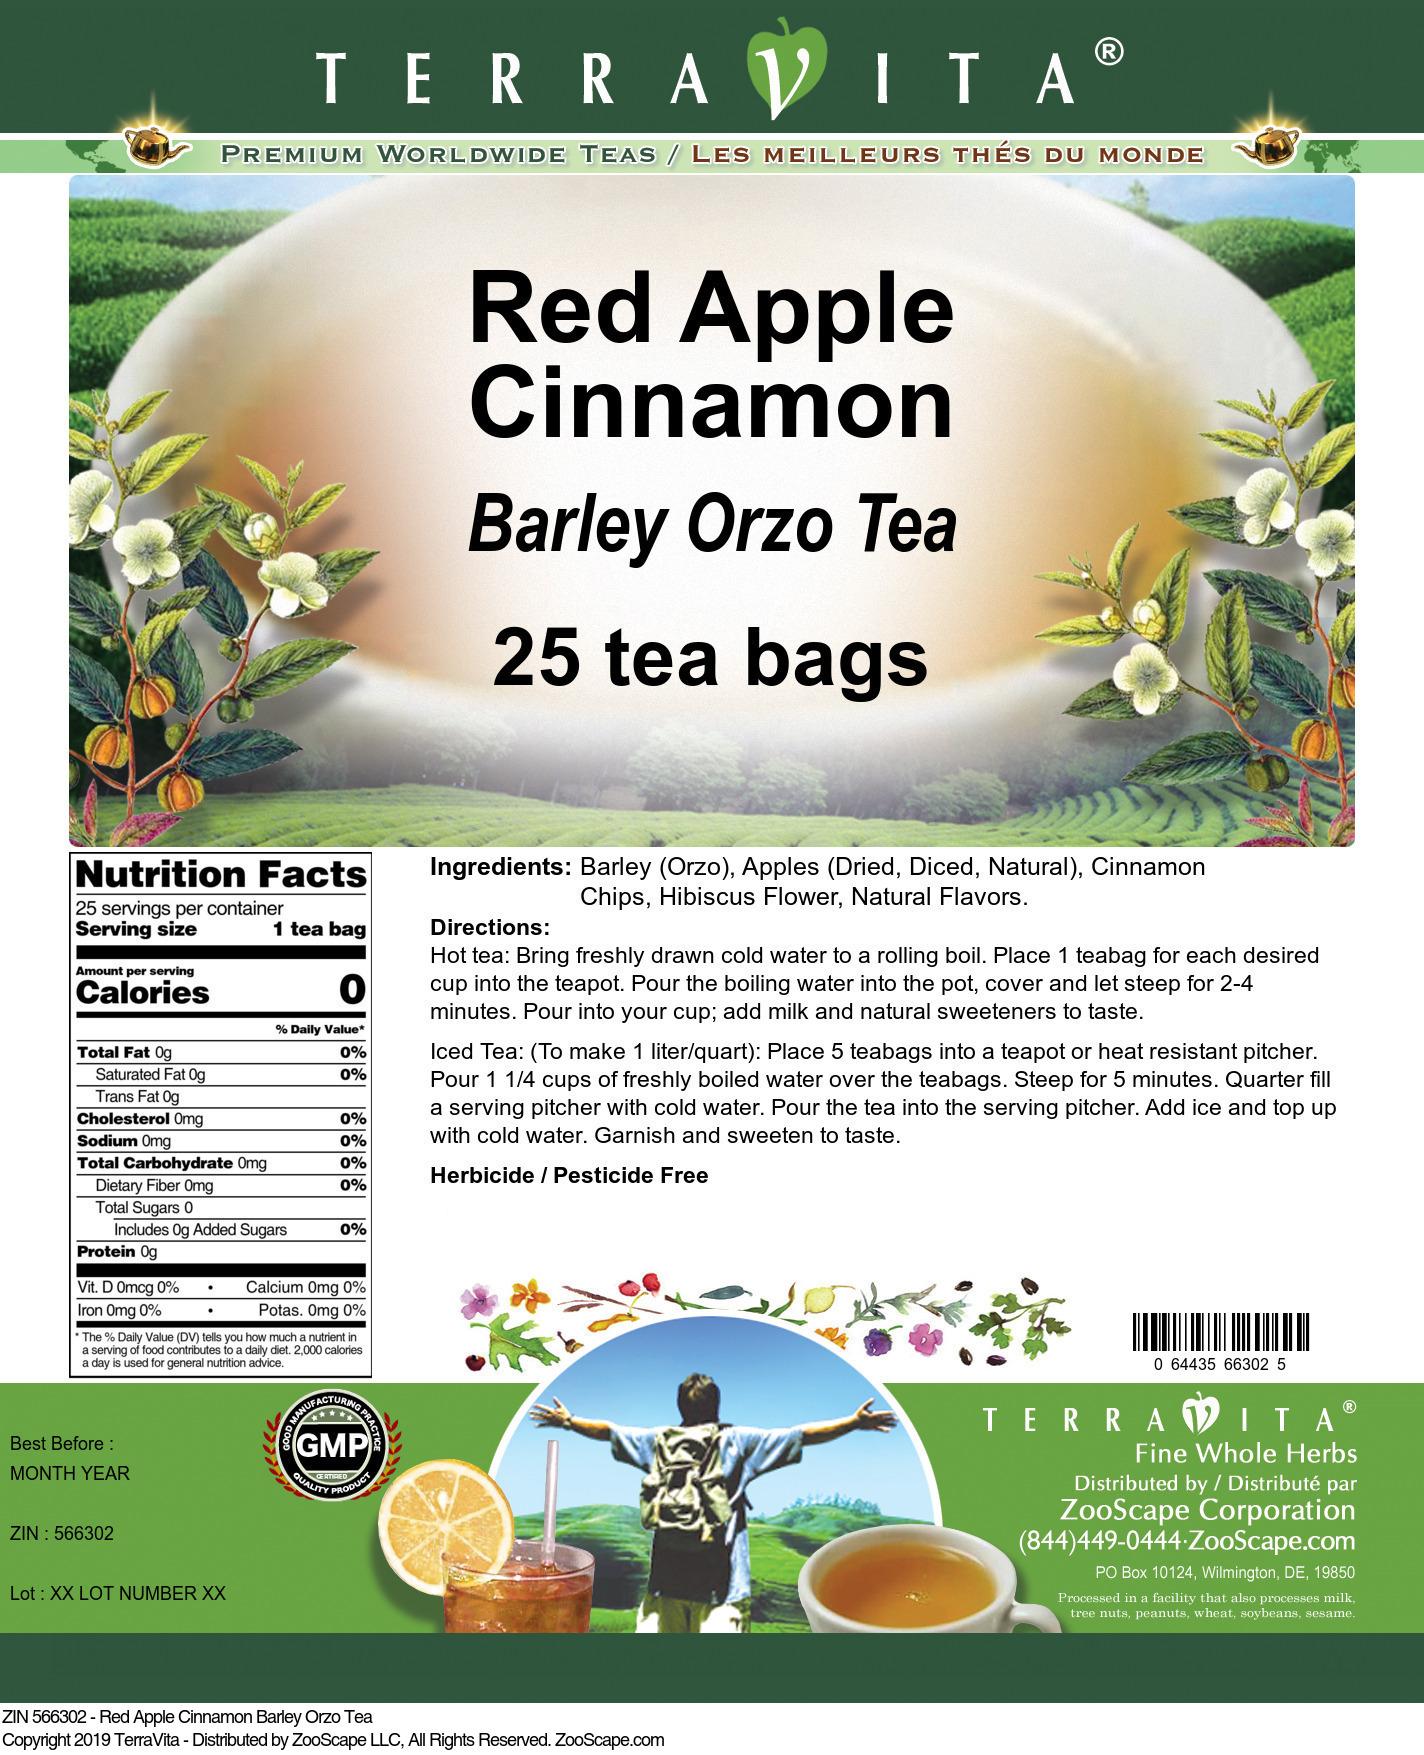 Red Apple Cinnamon Barley Orzo Tea